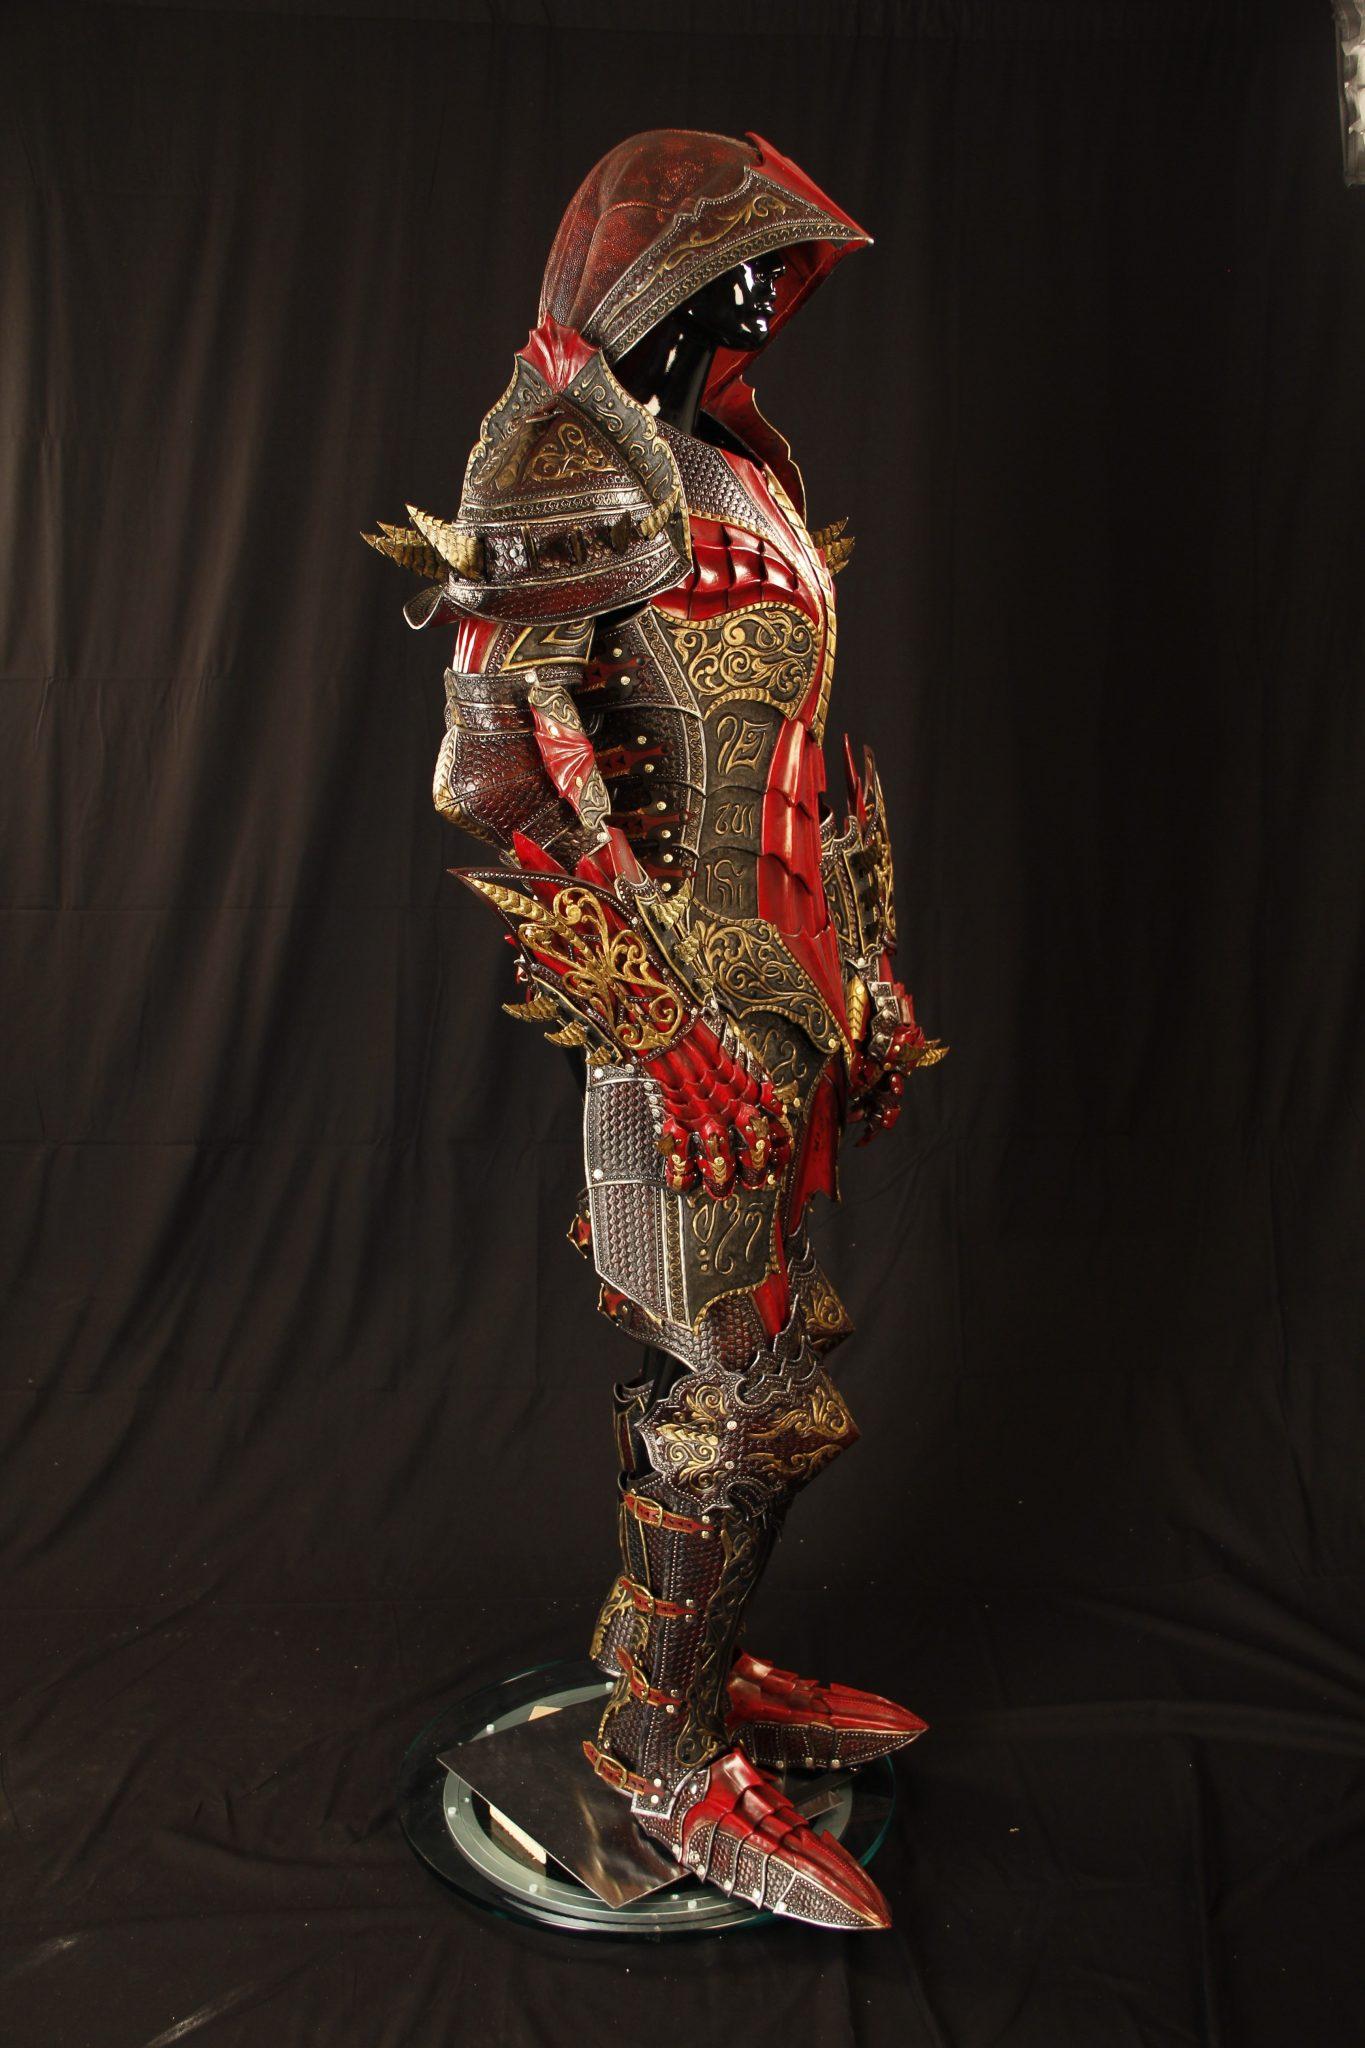 Galleries - Prince Armory | Gallery, Armory, Custom creations